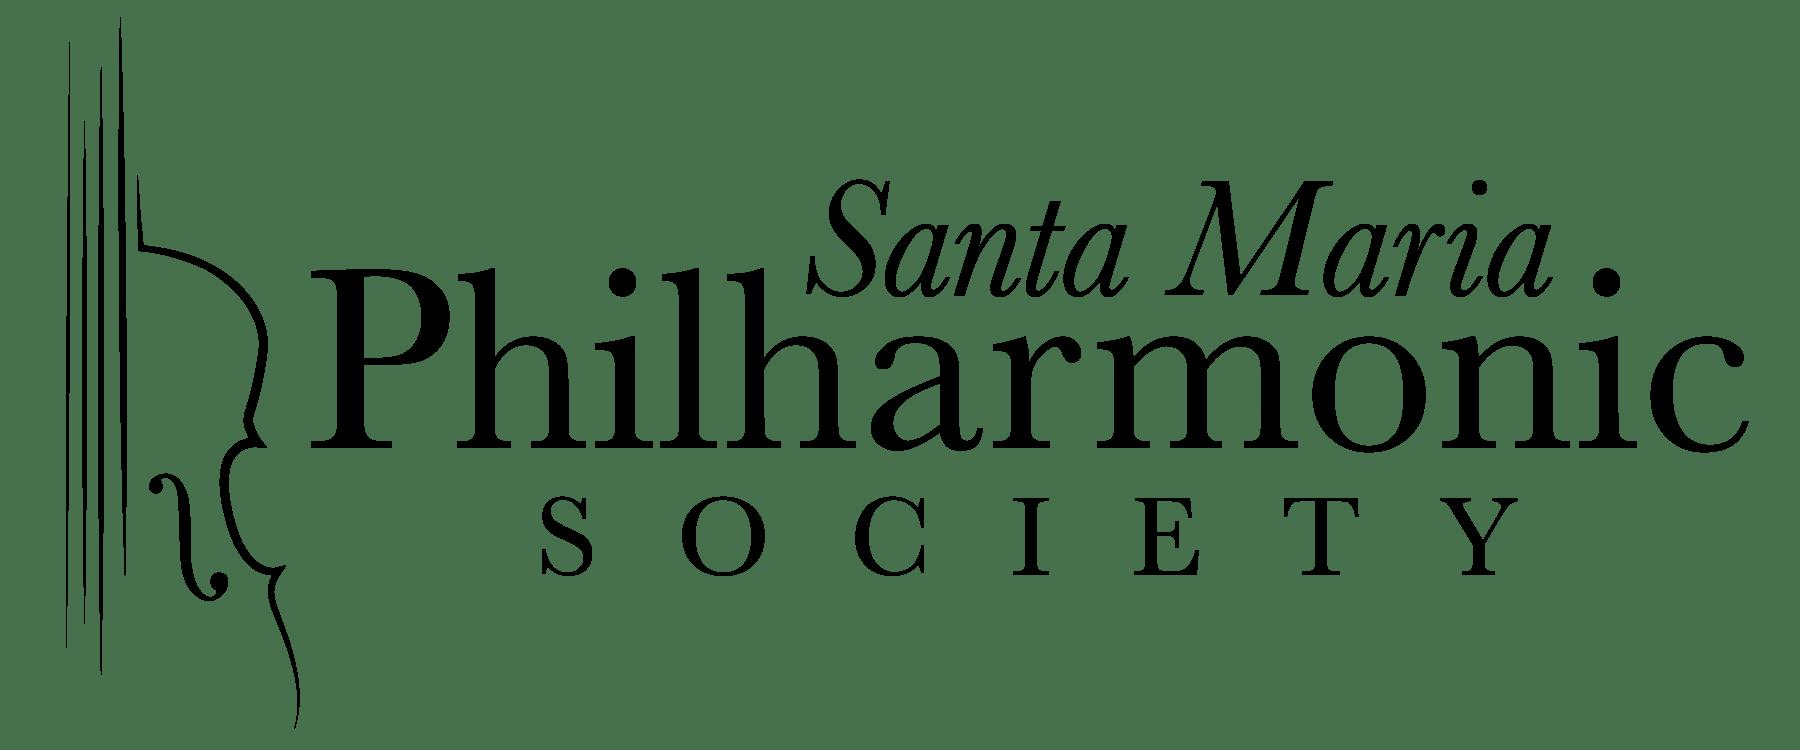 Santa Maria Philharmonic Presents Free Family Concert Next